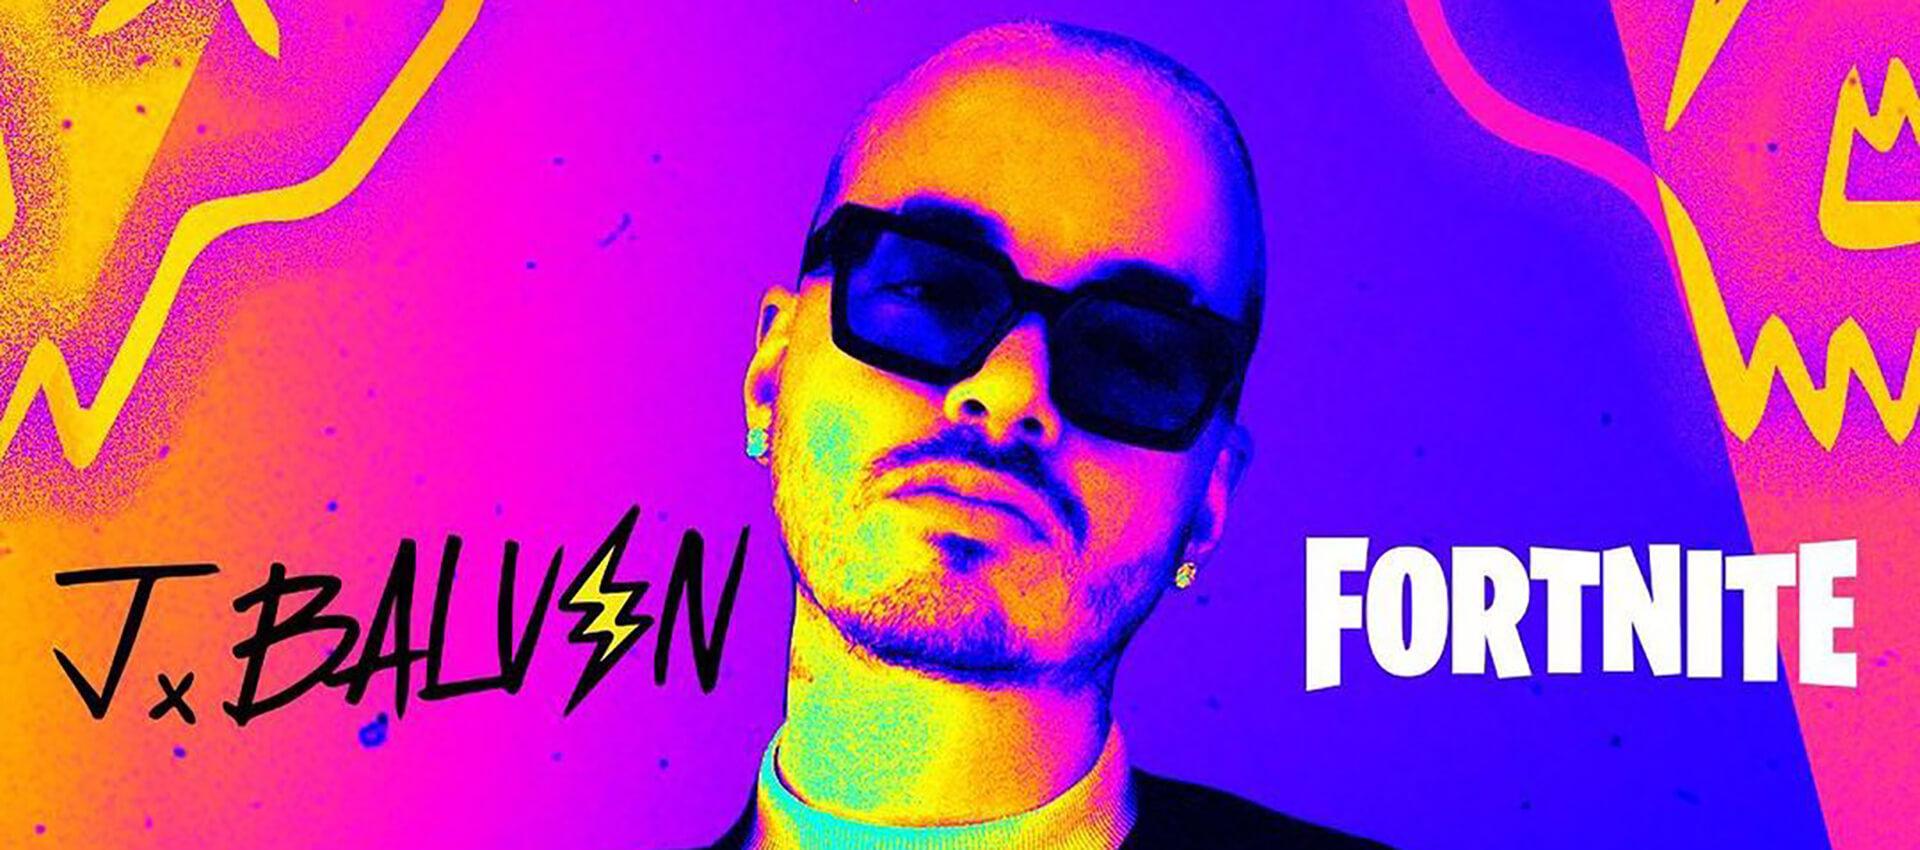 J Balvin – El Primer Latino en Actuar Dentro del Videojuego, Fortnite